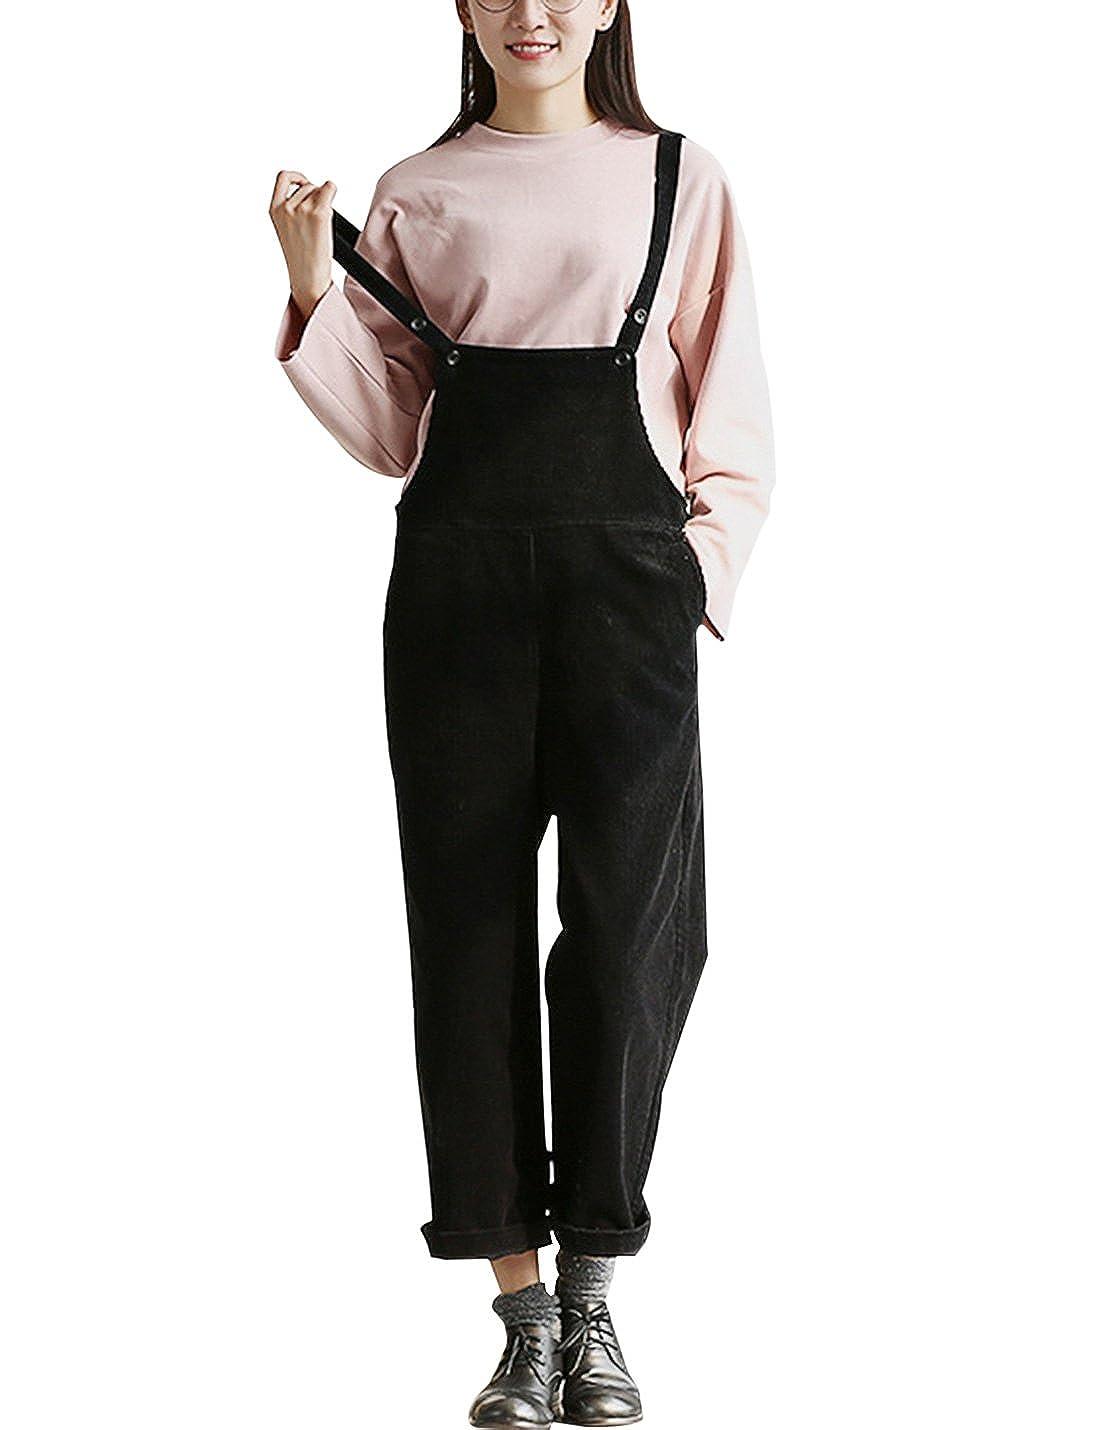 c40b92c53ed Amazon.com  Gihuo Women s Vintage Bib Overall Corduroy High Rise Jumpsuit  Sleeveless Cropped Romper (Black